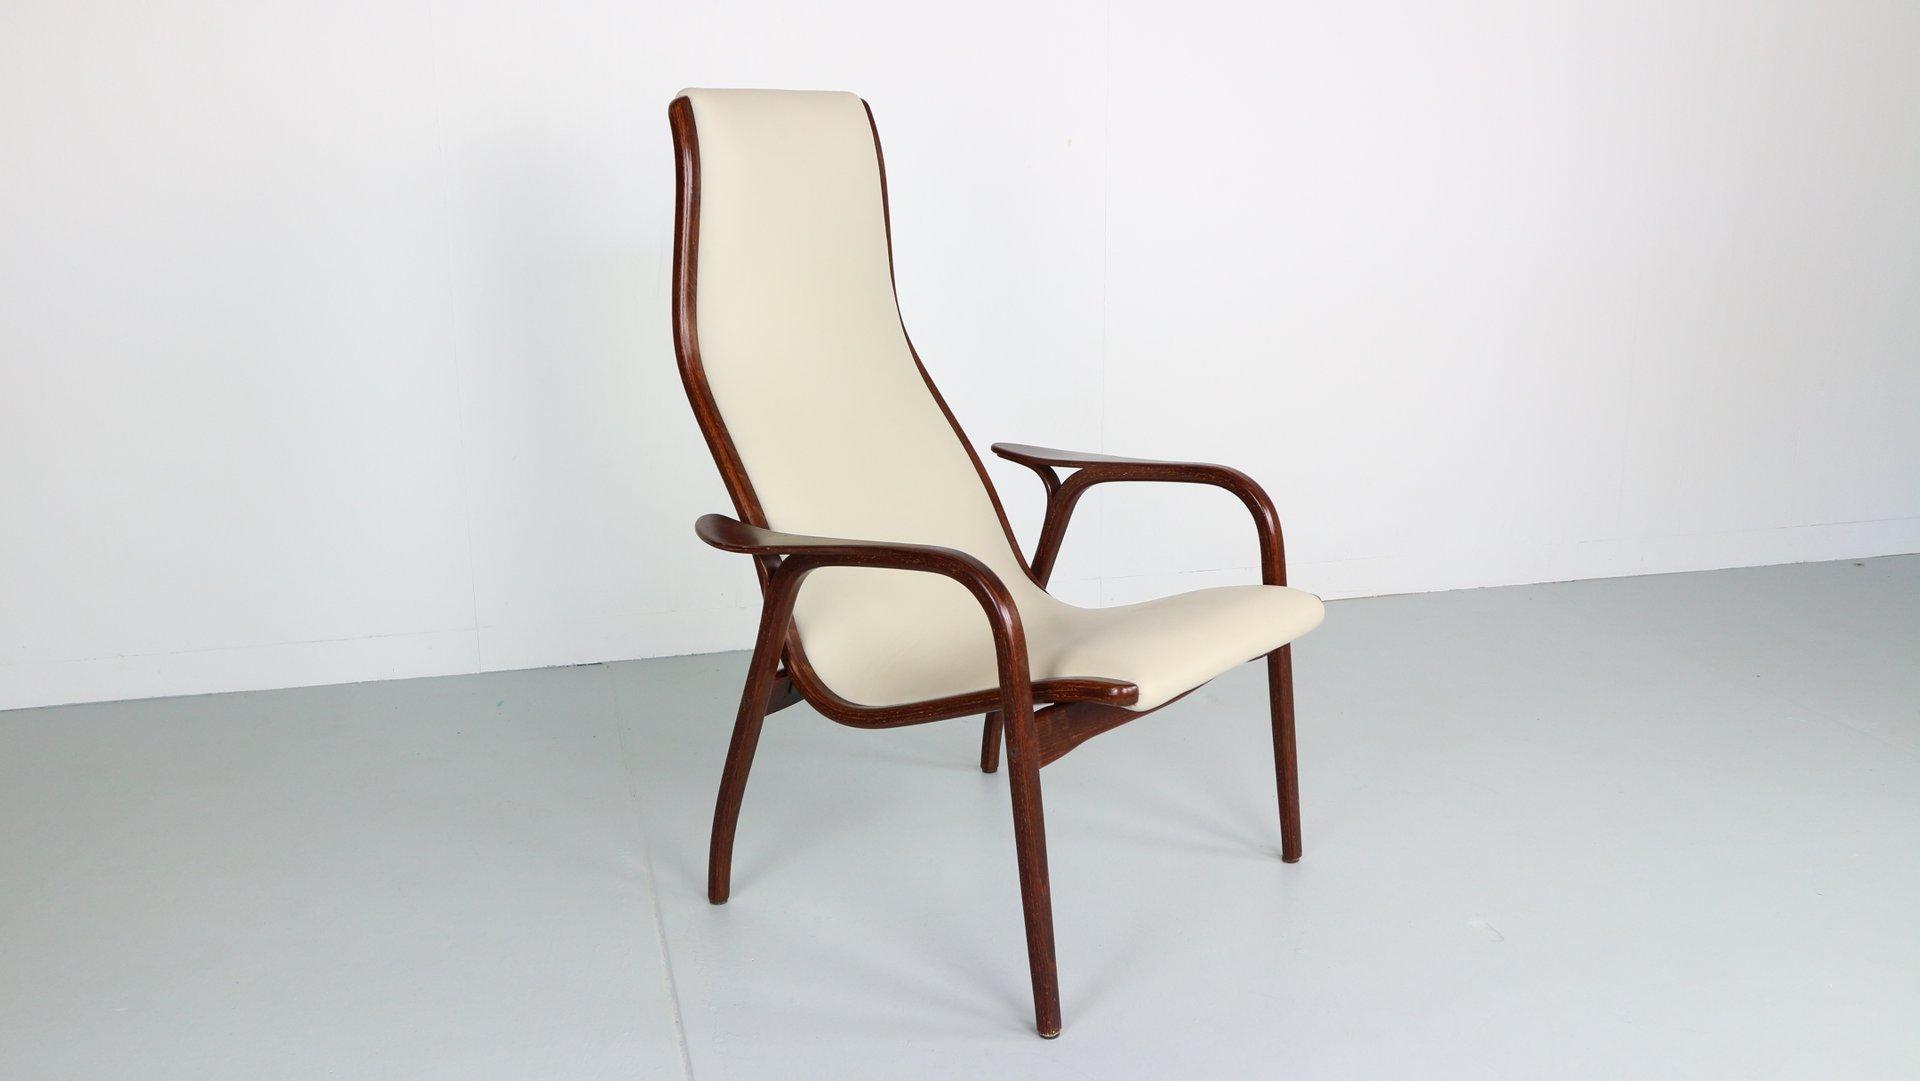 Leder & Wenge Holz Lamino Chair von Yngve Ekström für Swedese, 1950er